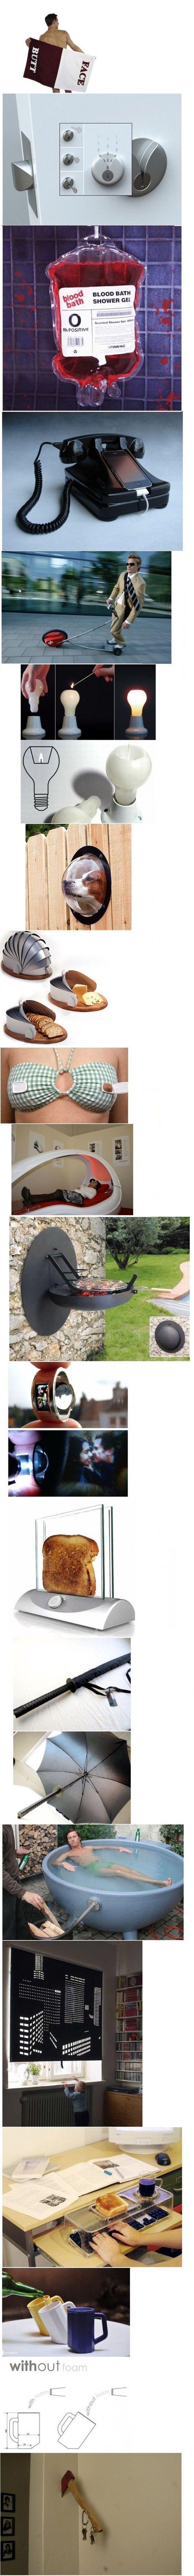 Cool & weird inventions